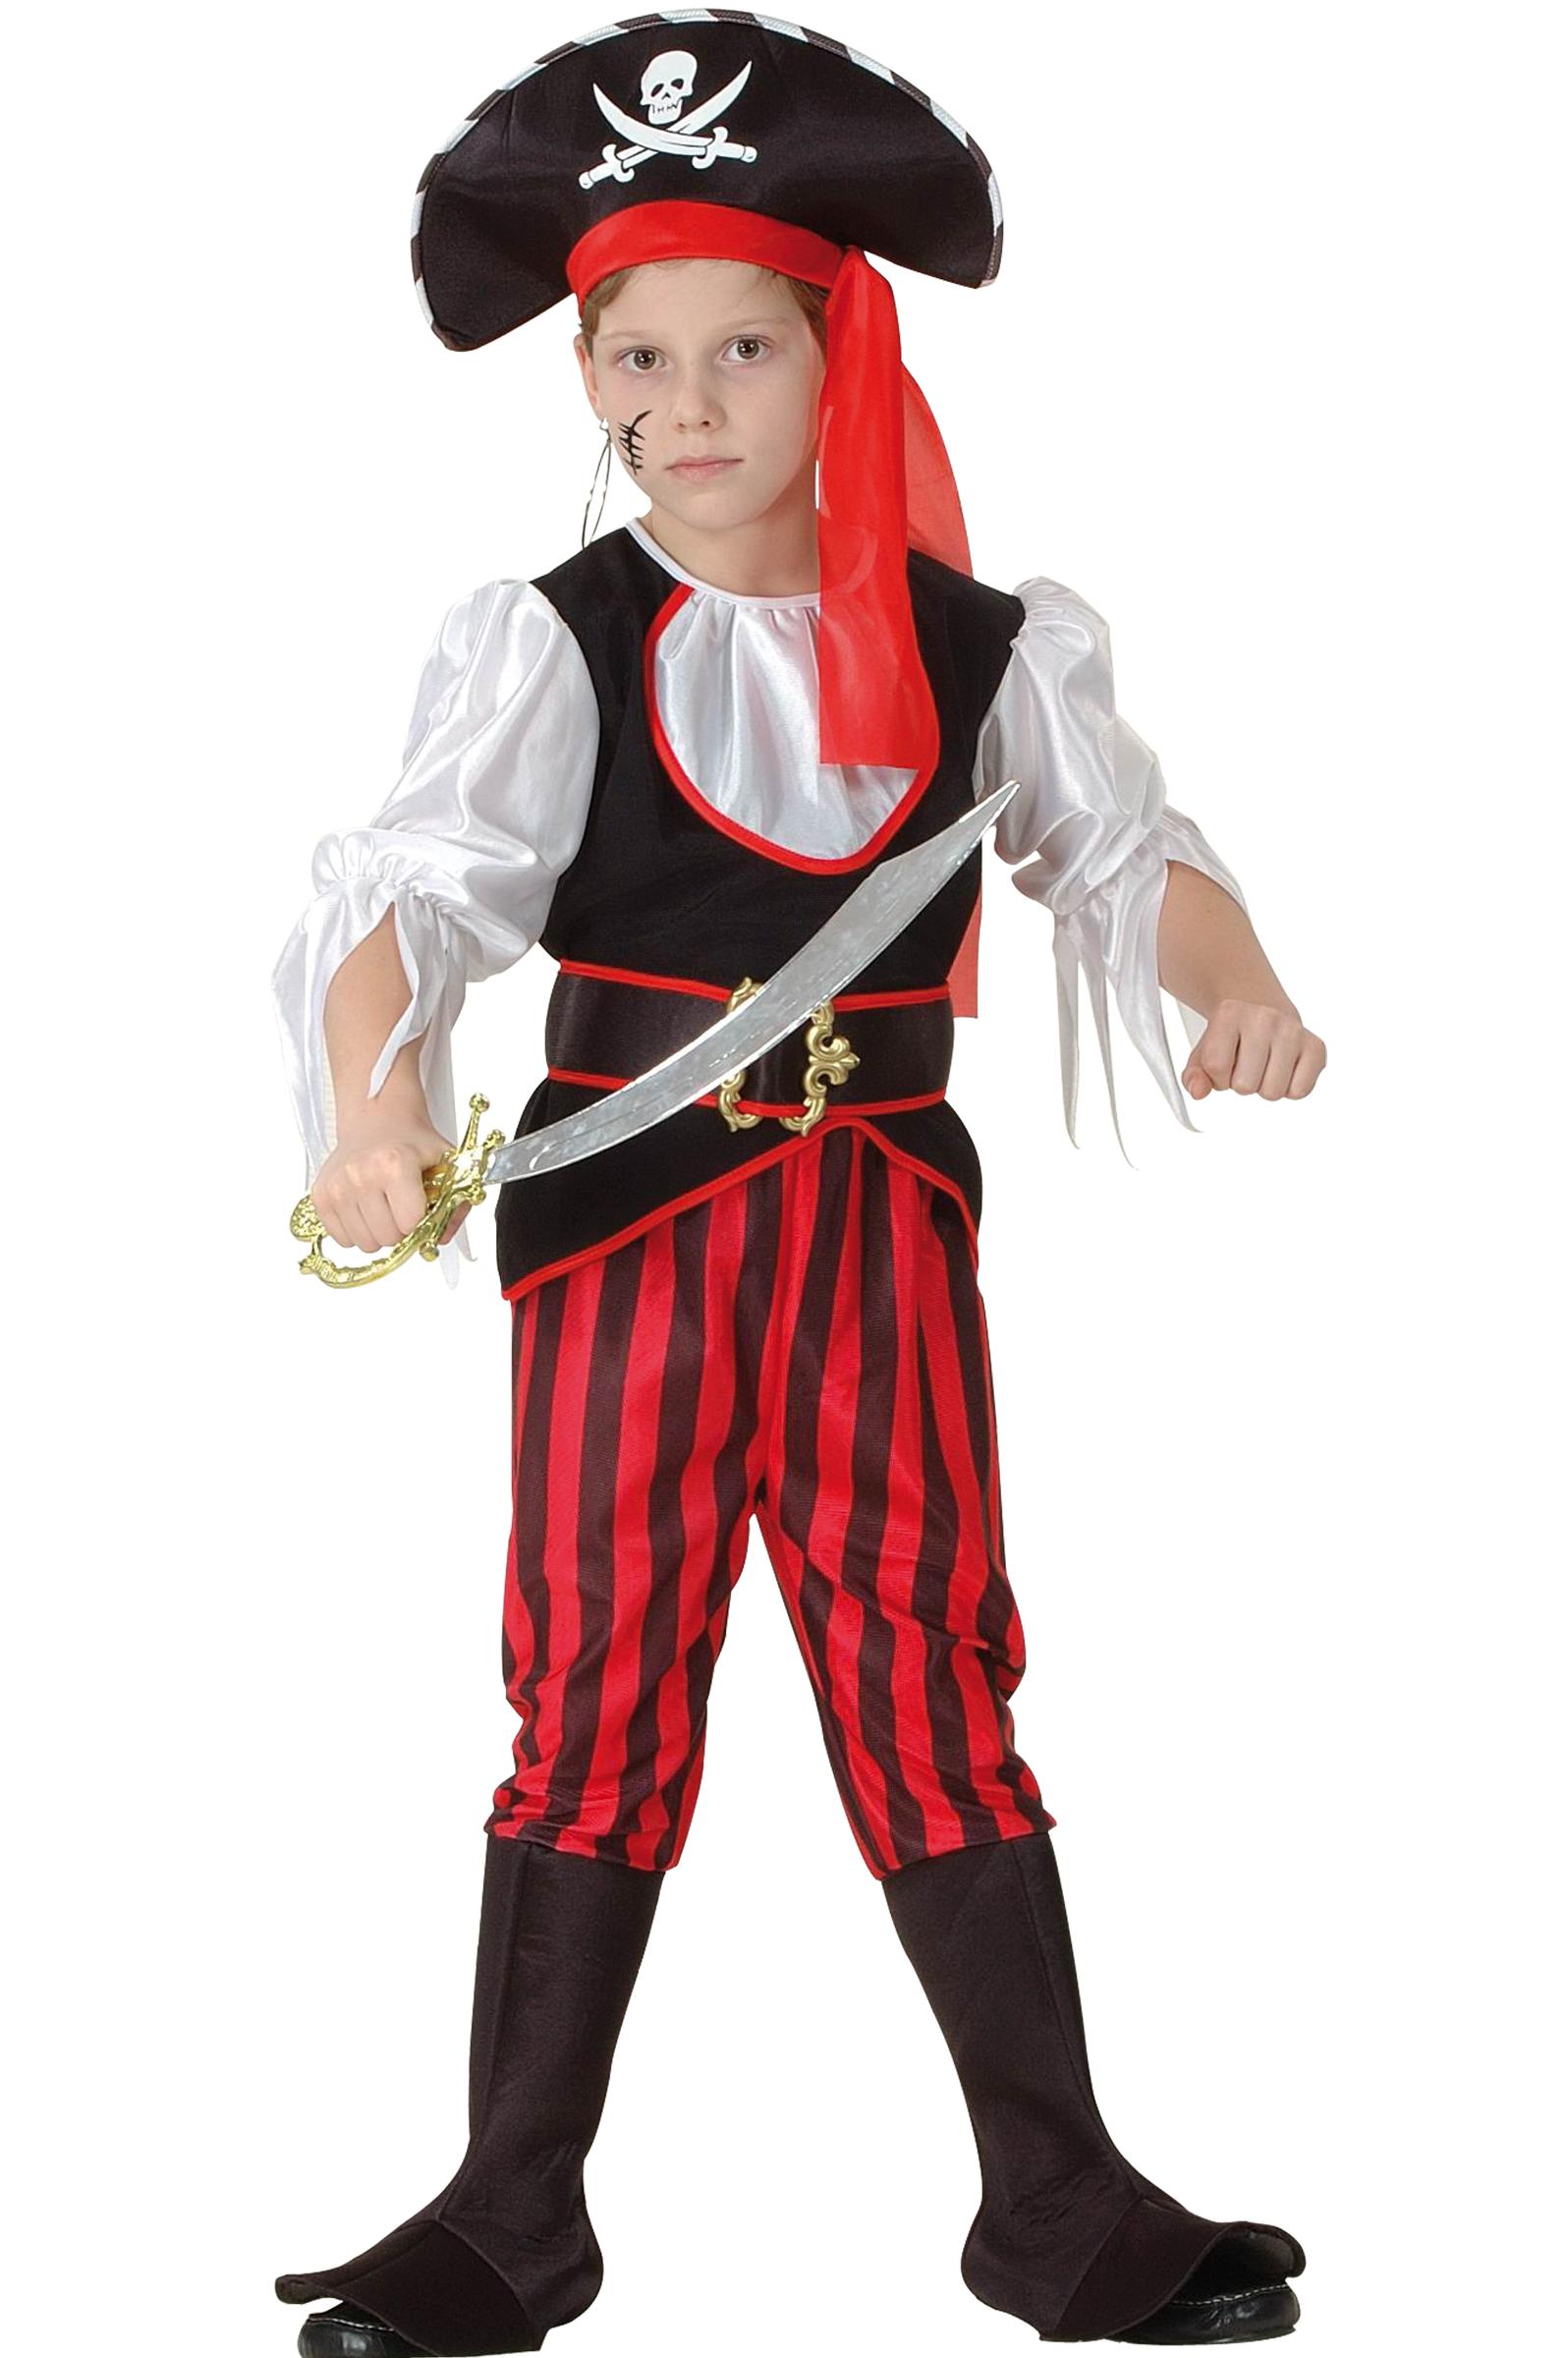 d guisement pirate gar on d guisement pirate pas cher costume carnaval. Black Bedroom Furniture Sets. Home Design Ideas